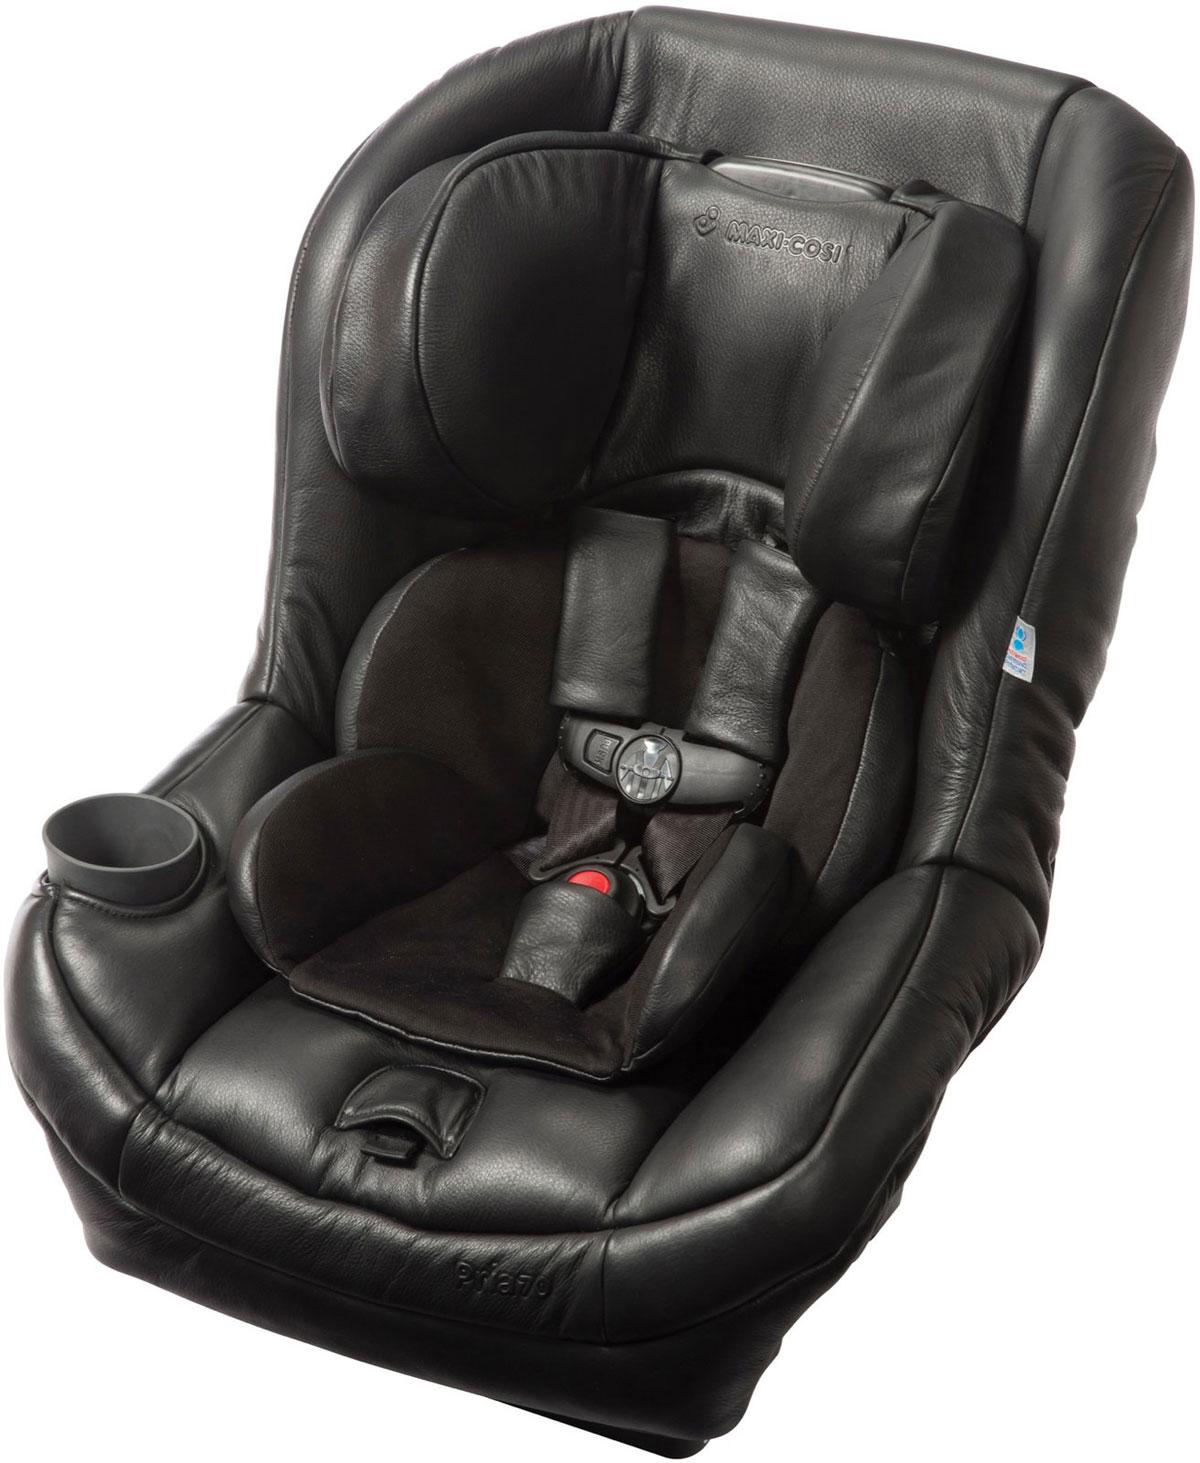 Leather Car Seats >> Maxi-Cosi Limited Edition Pria 70 Leather Car Seat